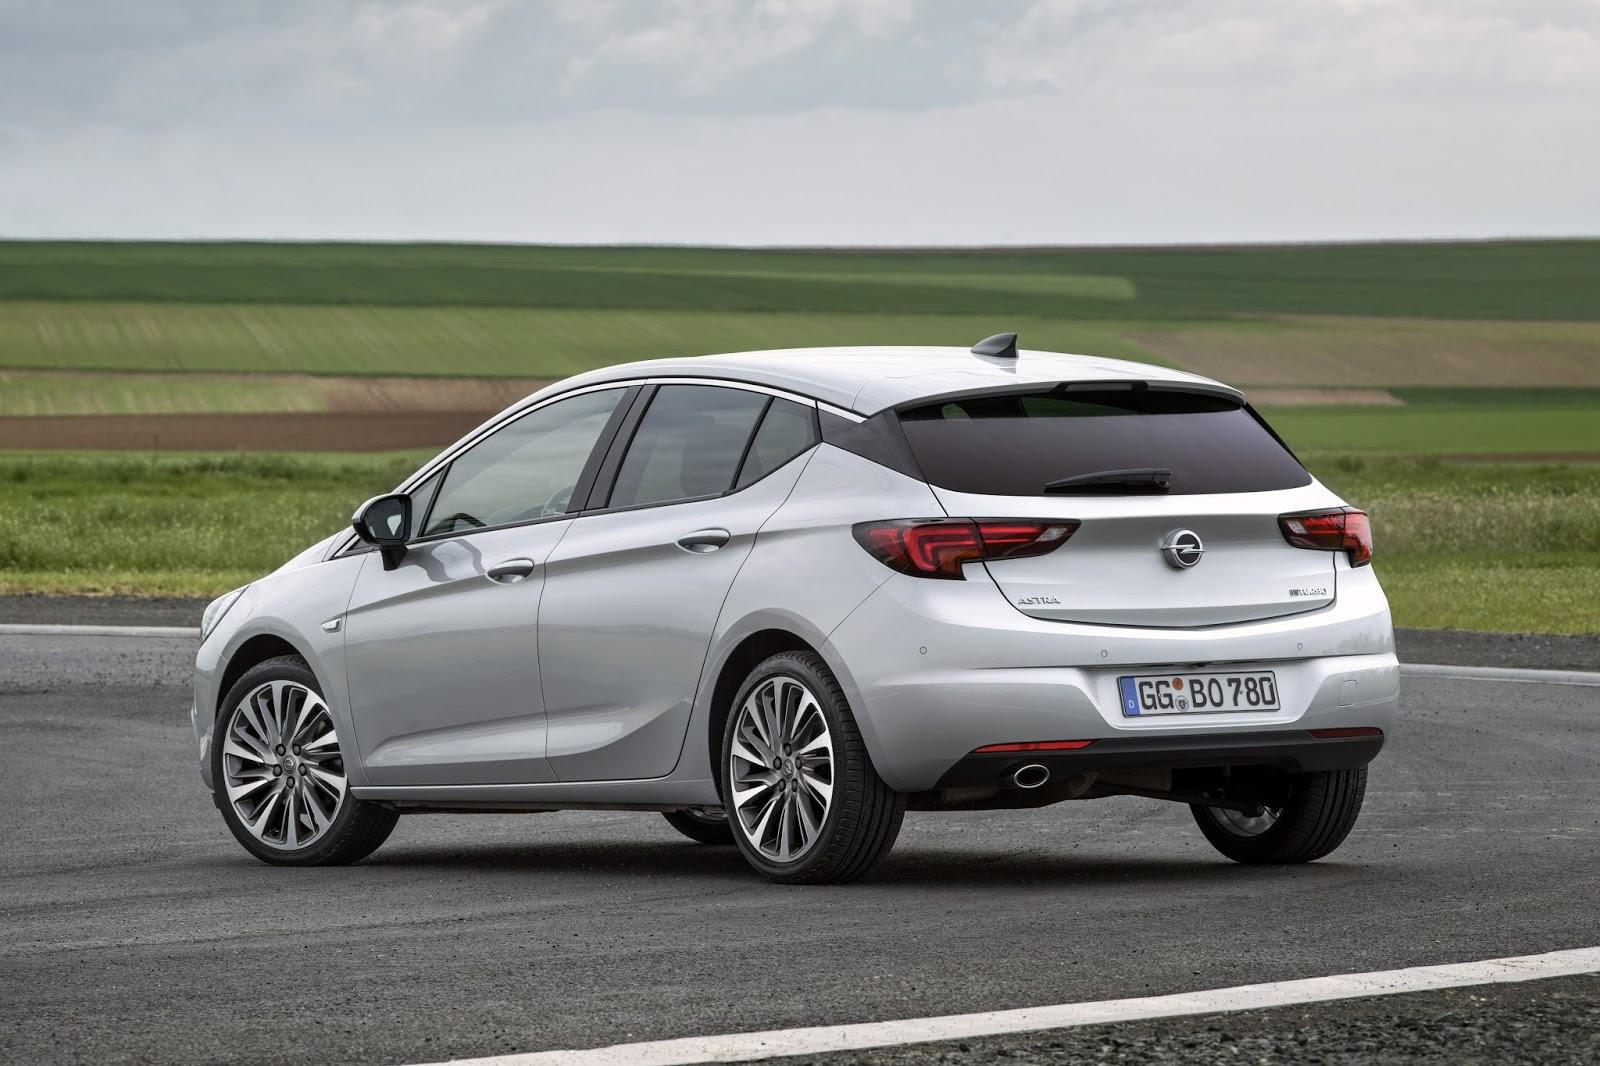 Opel Astra BiTurbo 5 door 301327 Το καυτό Opel Astra BiTurbo diesel συνδυάζει τις επιδόσεις με την οικονομία! Hatchback, Opel, Opel Astra, Opel Astra BiTurbo, Opel Astra BiTurbo Hatchback, twin-turbo